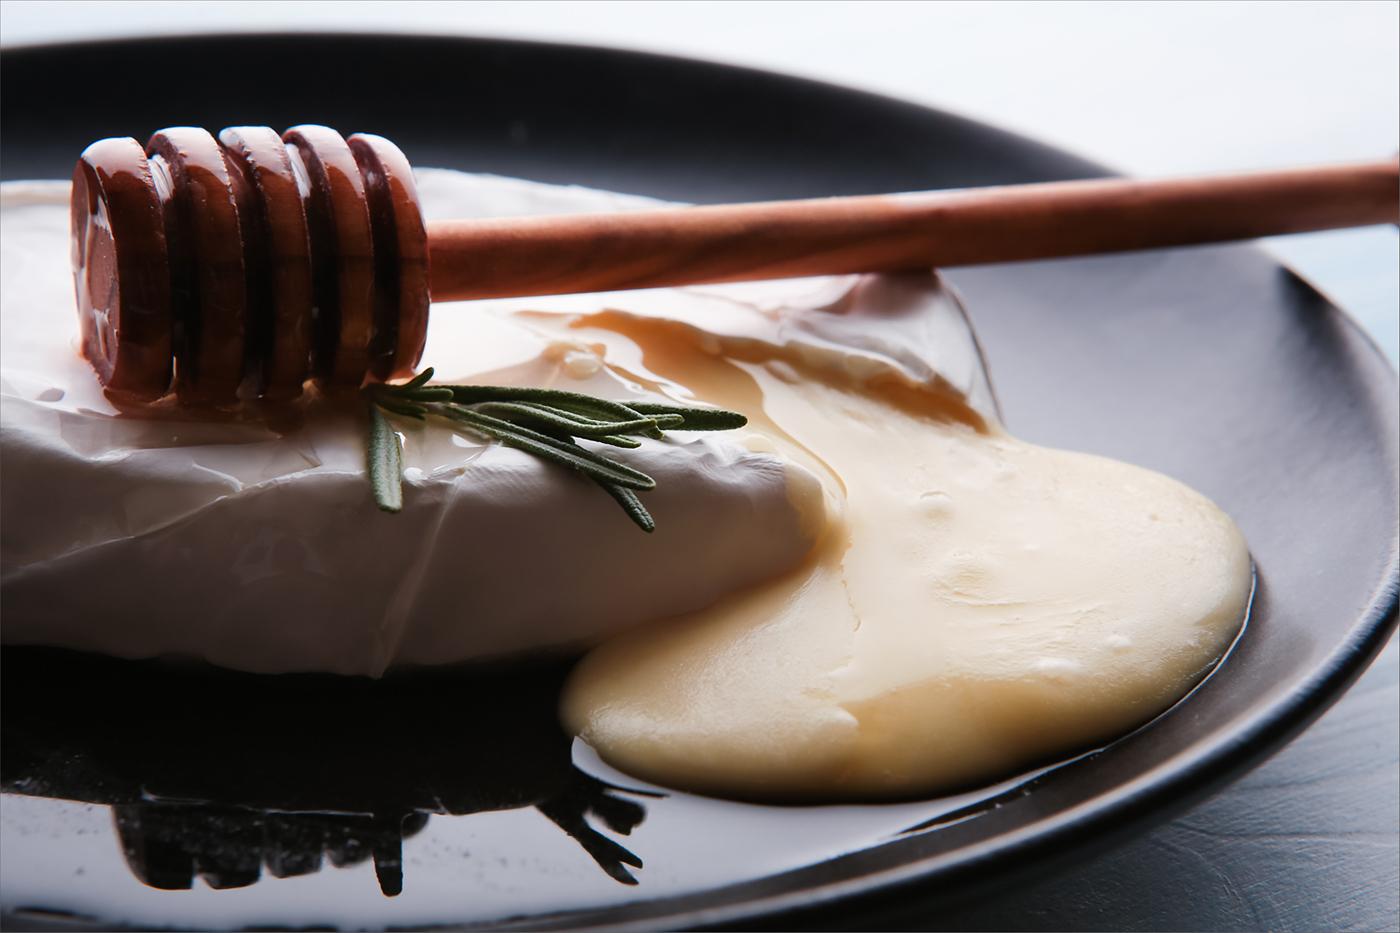 Вкусный завтрак / Food photo for Pastourelle / Ольга Драч Olga Drach